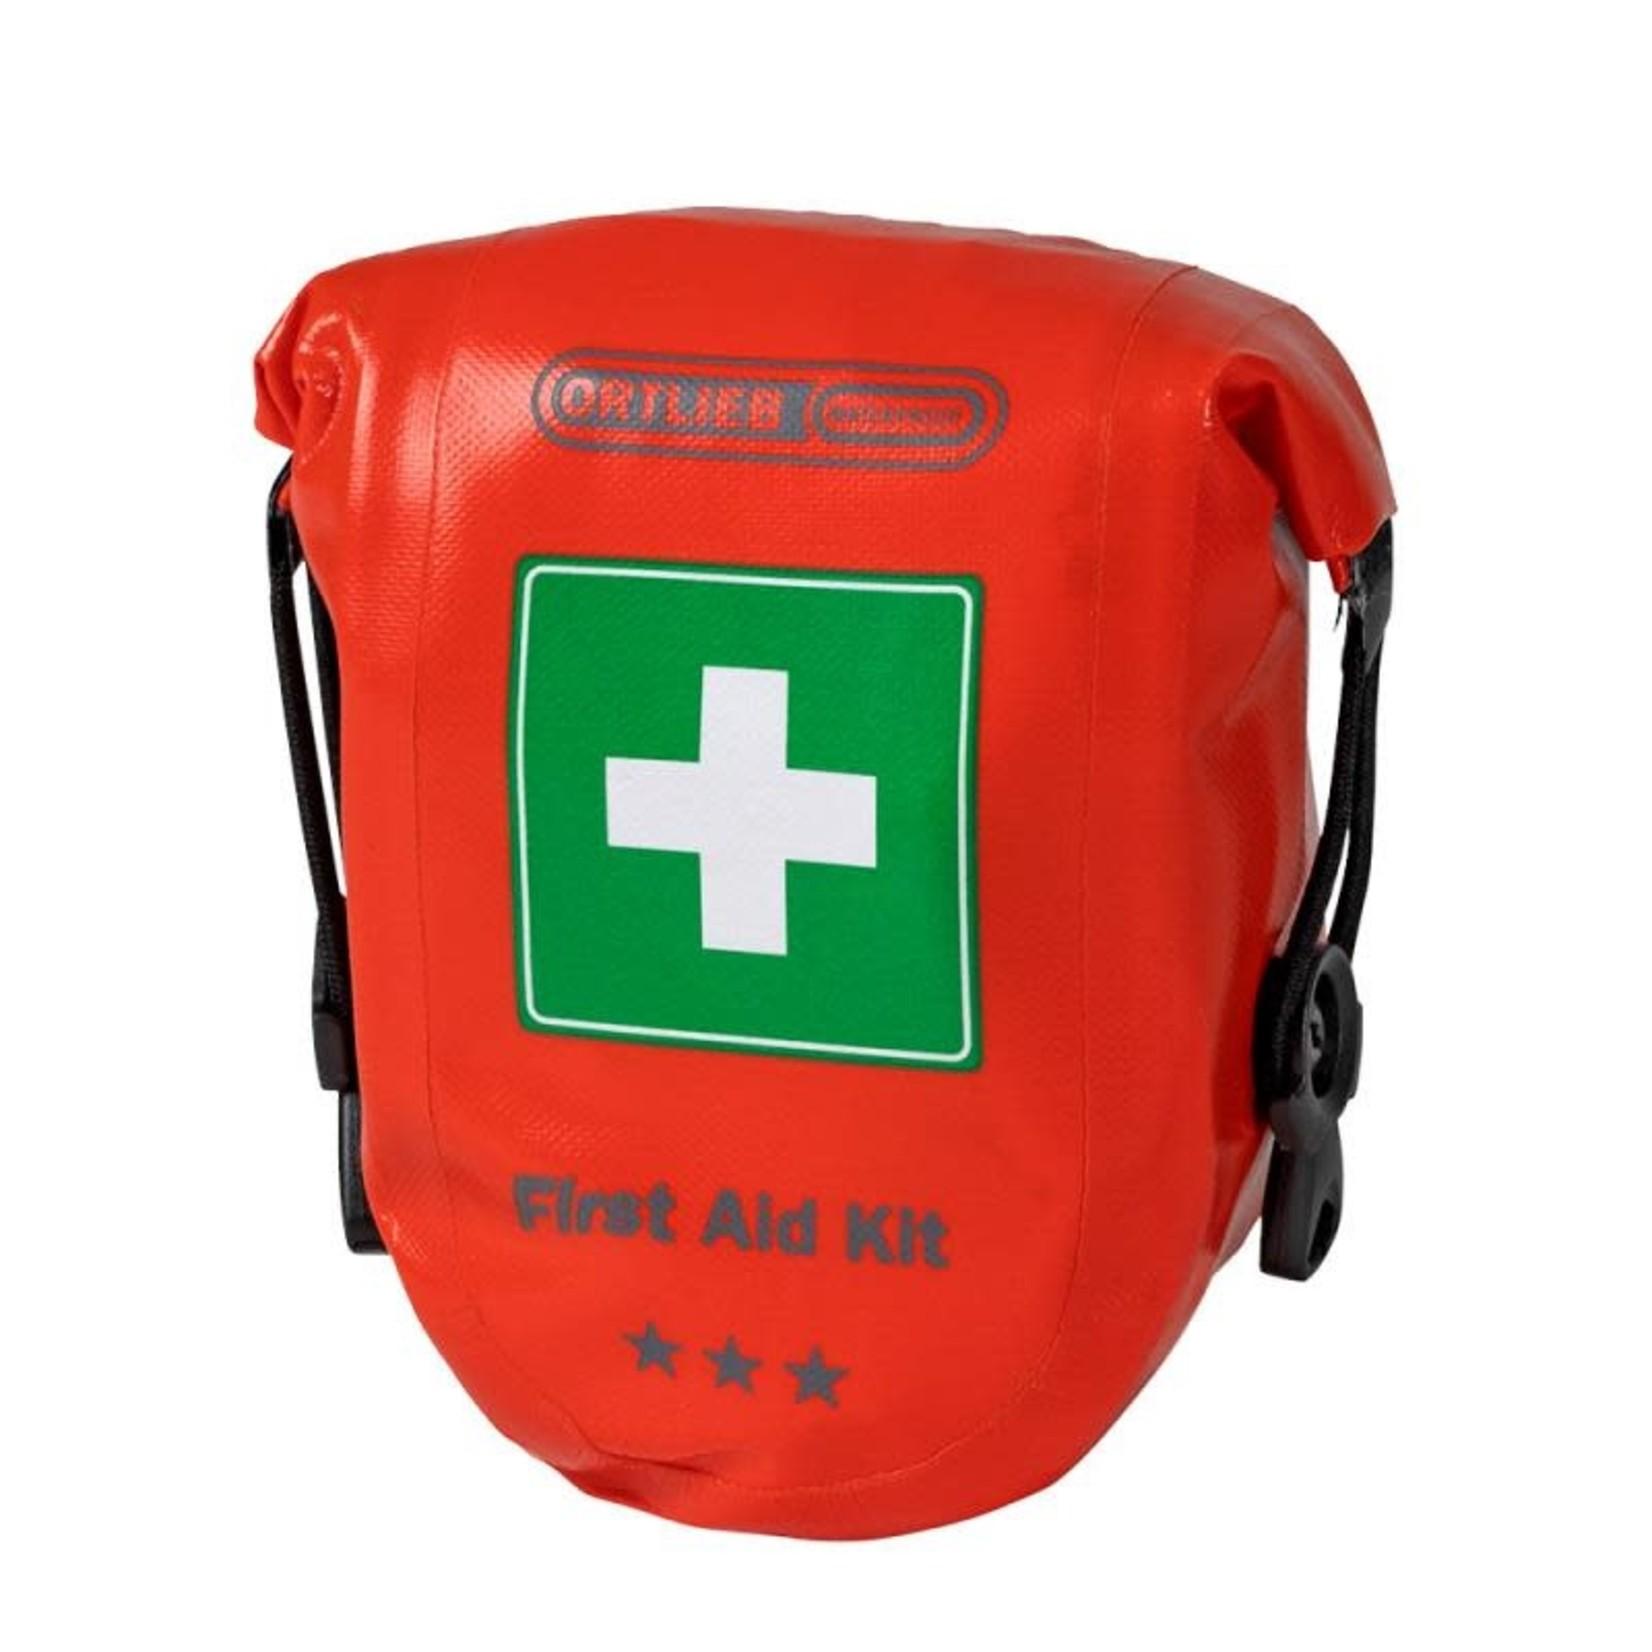 ORTLIEB ORTLIEB - First Aid Kit red